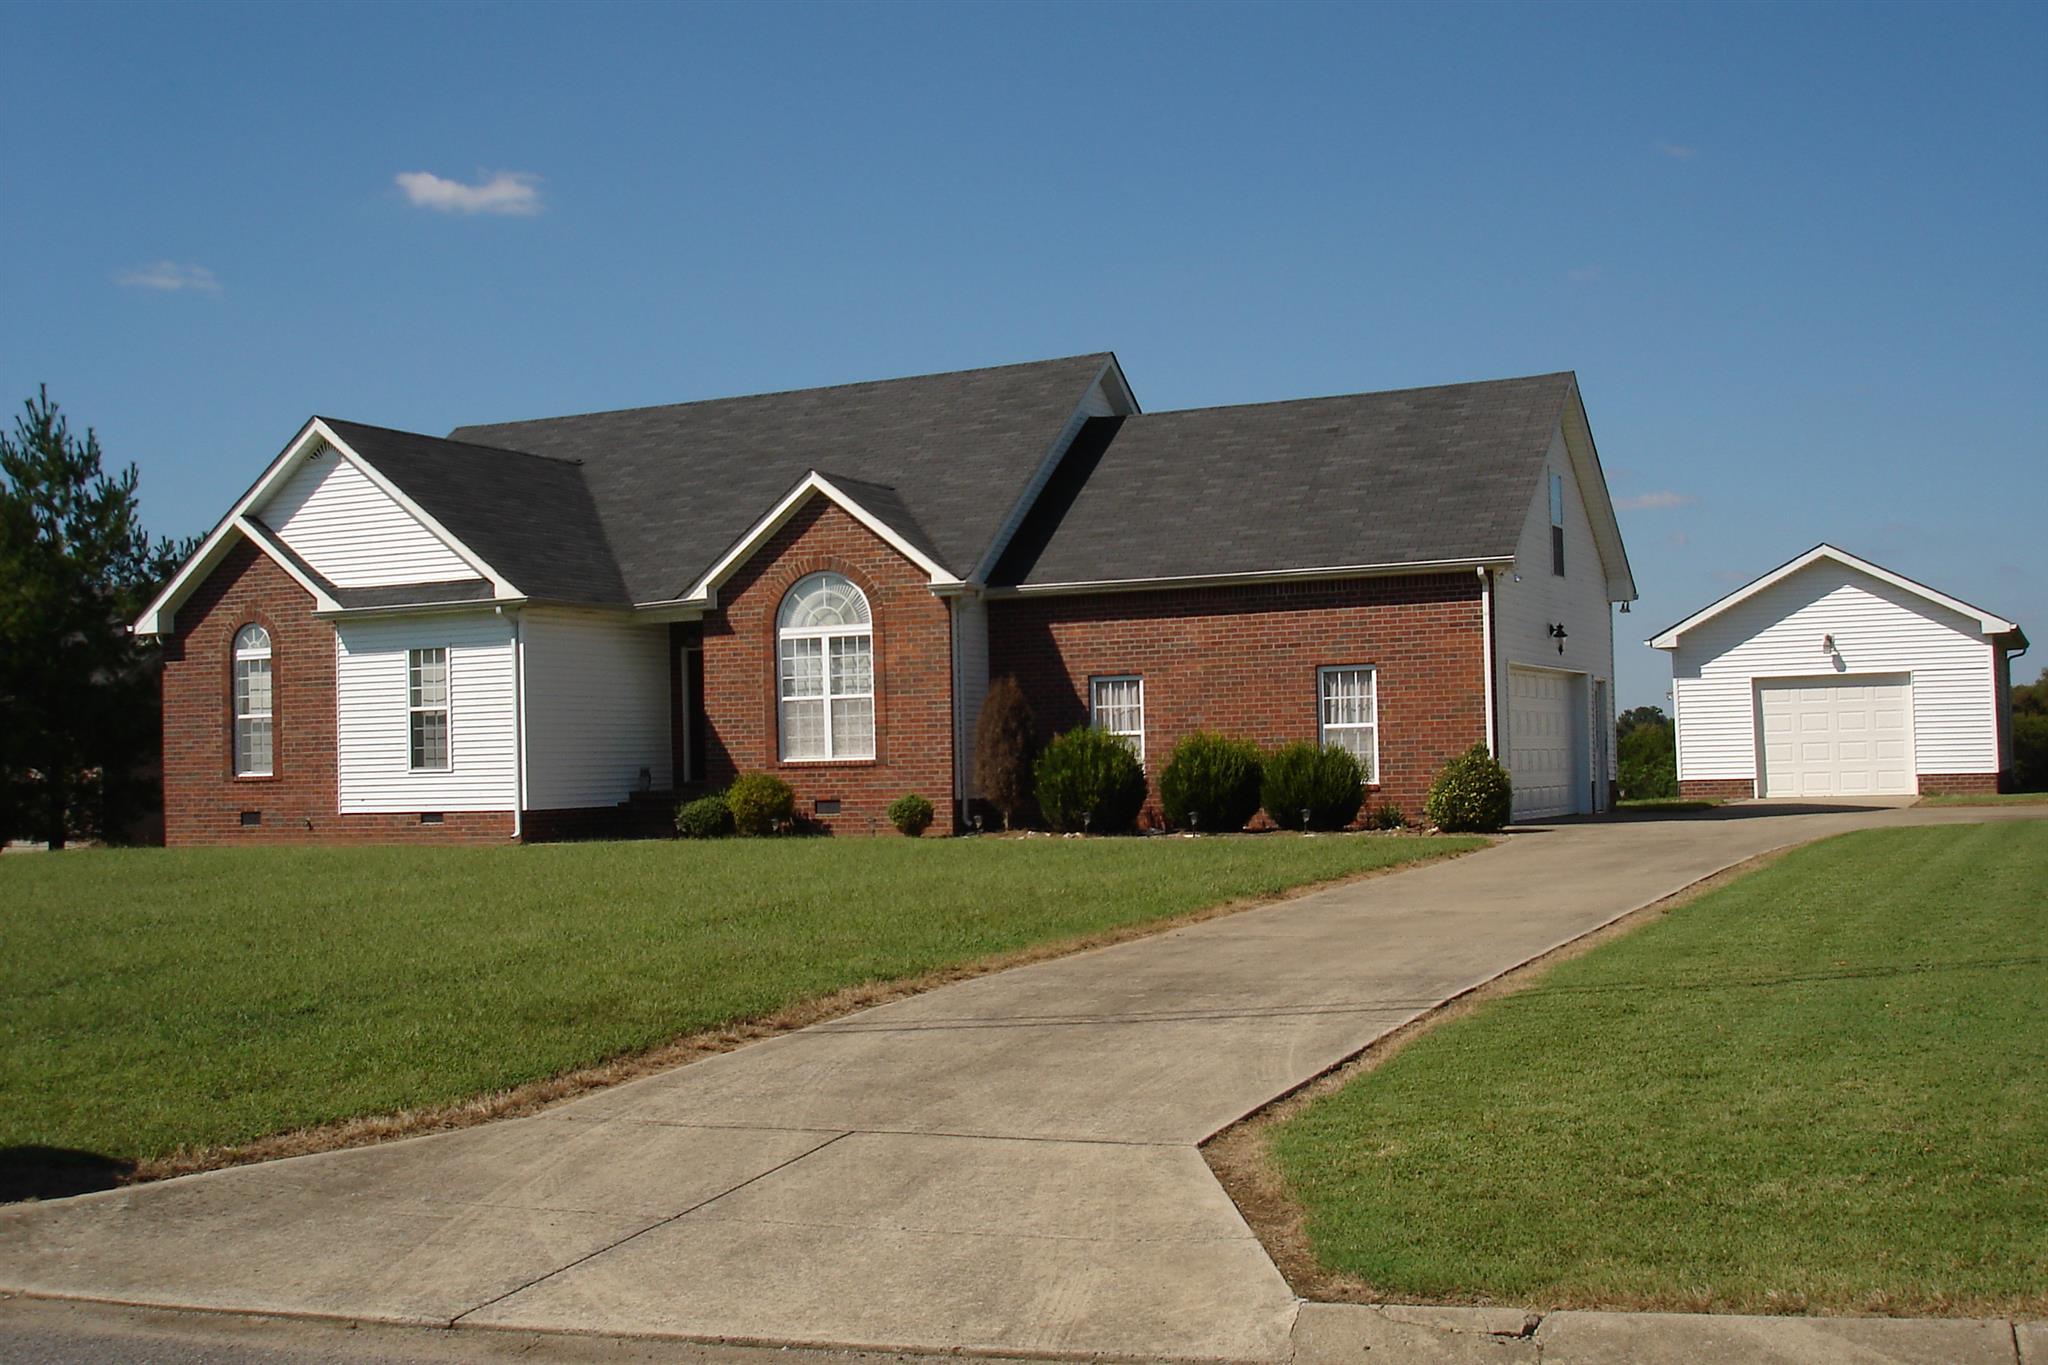 Photo of 1011 Hiltonwood Blvd  Castalian Springs  TN